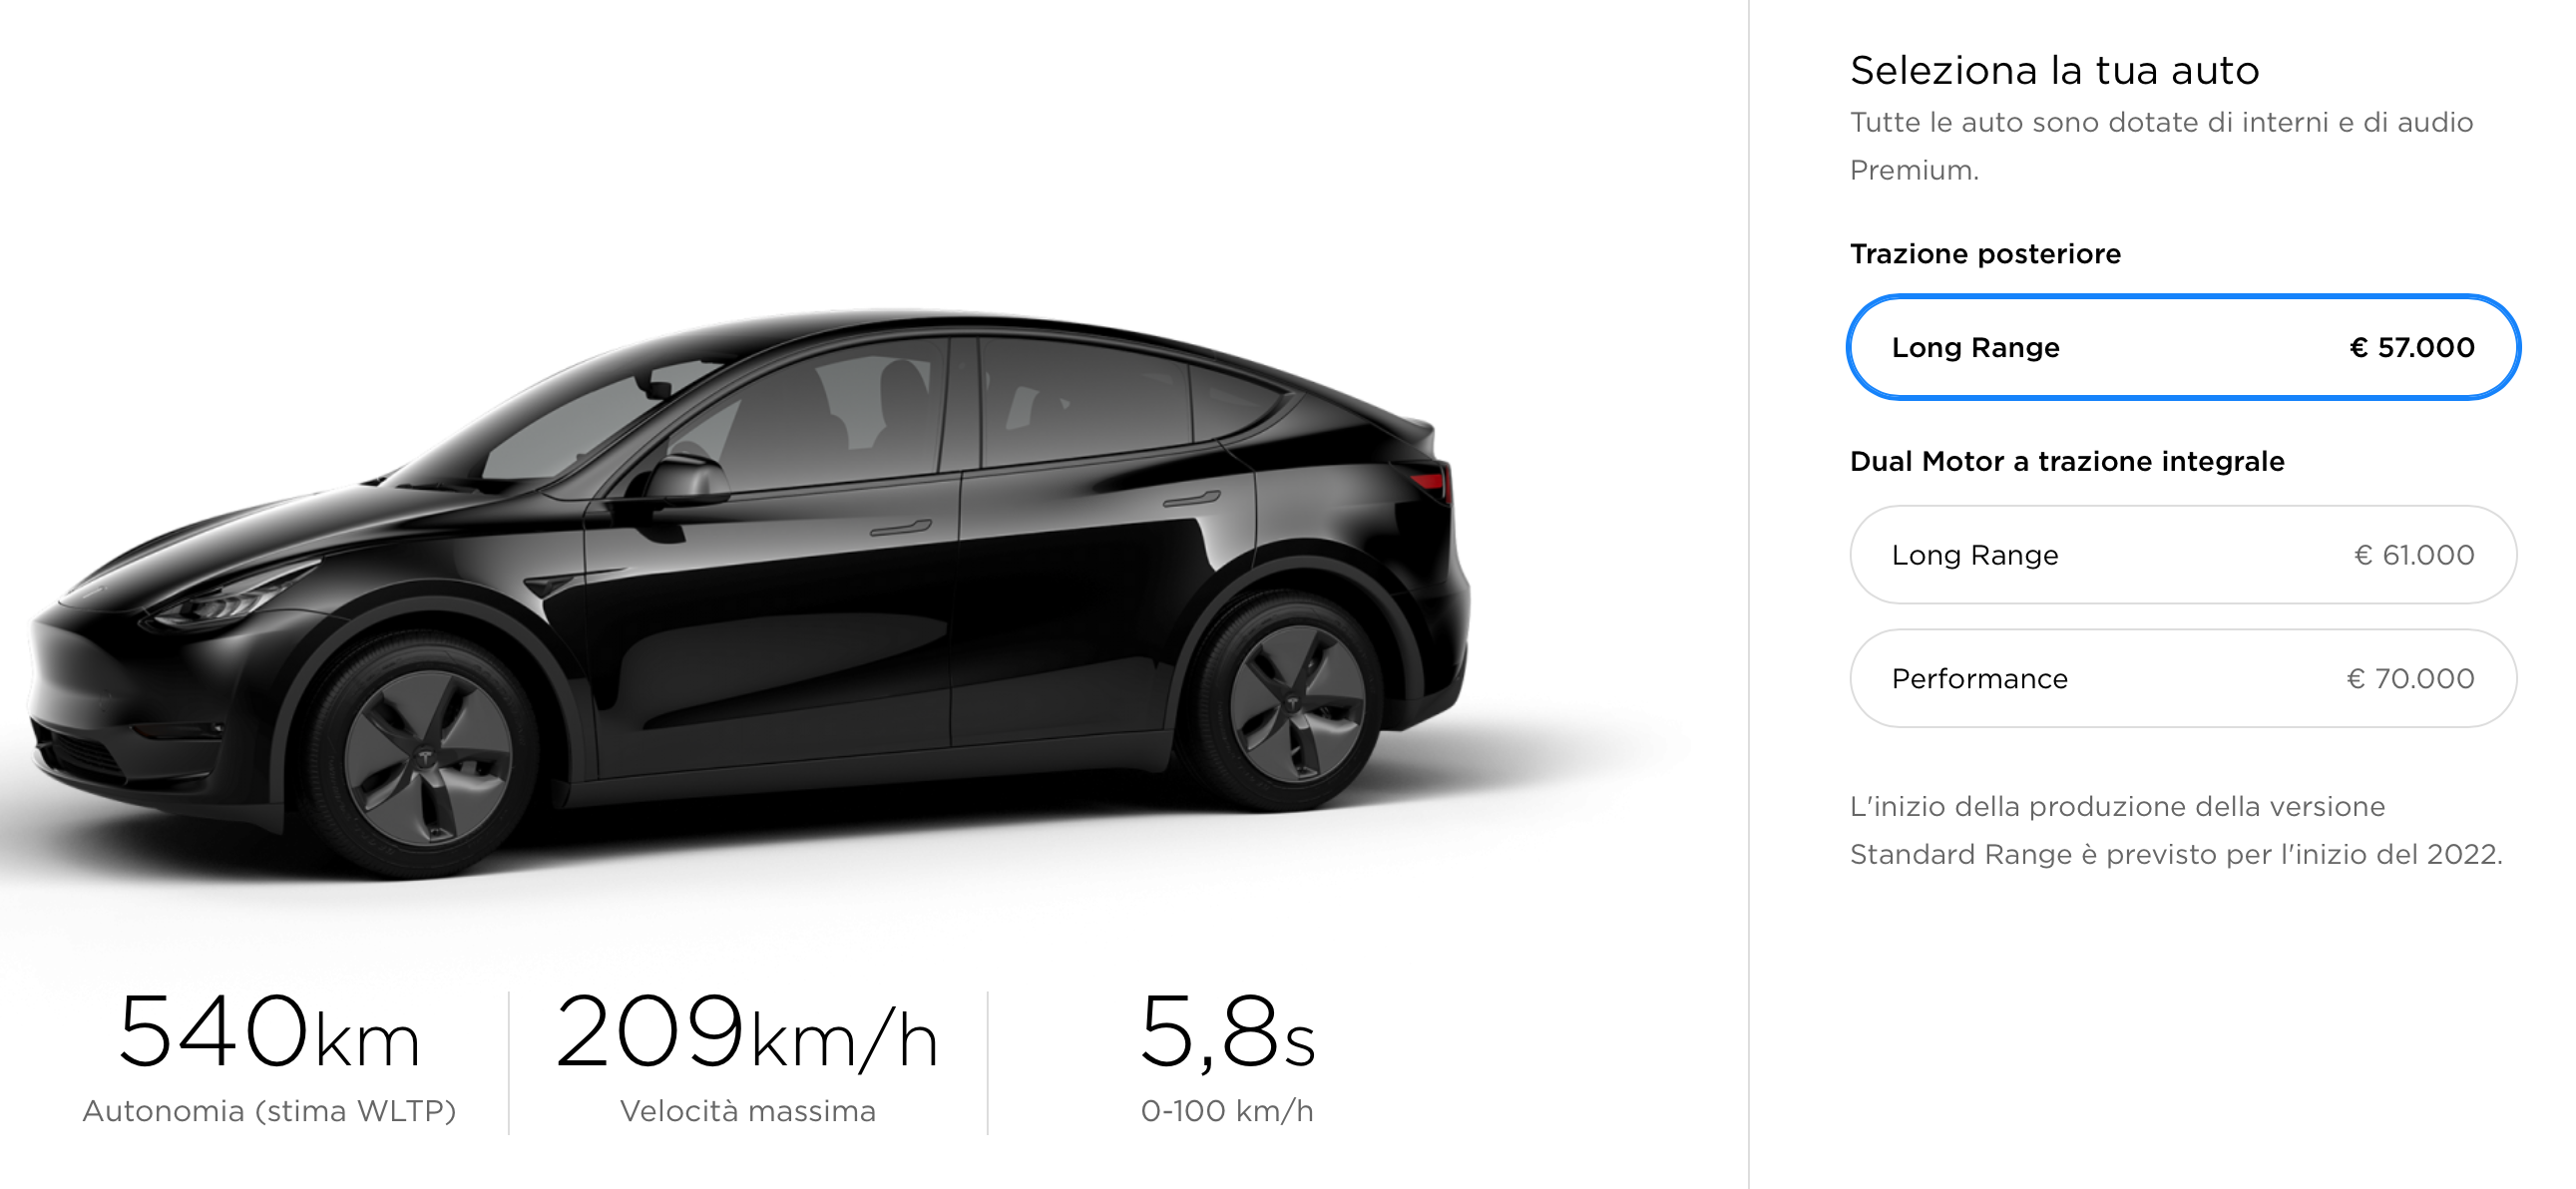 Tesla Model Y in Italia dal 2021 al prezzo base di 57.000 euro 1